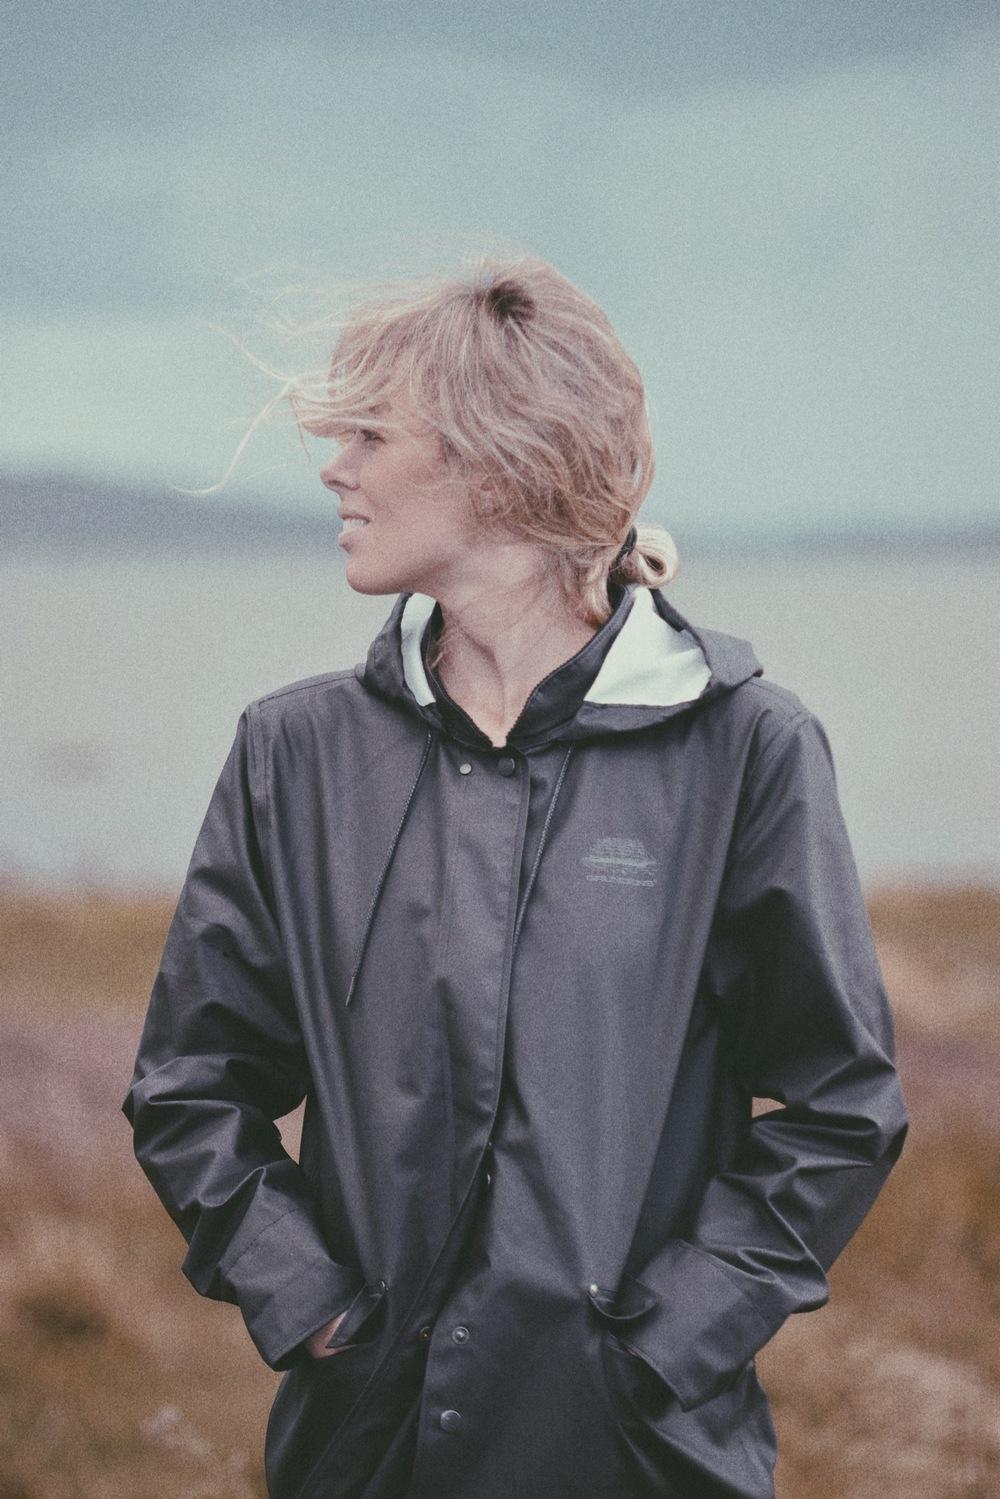 women's fårö.jpg